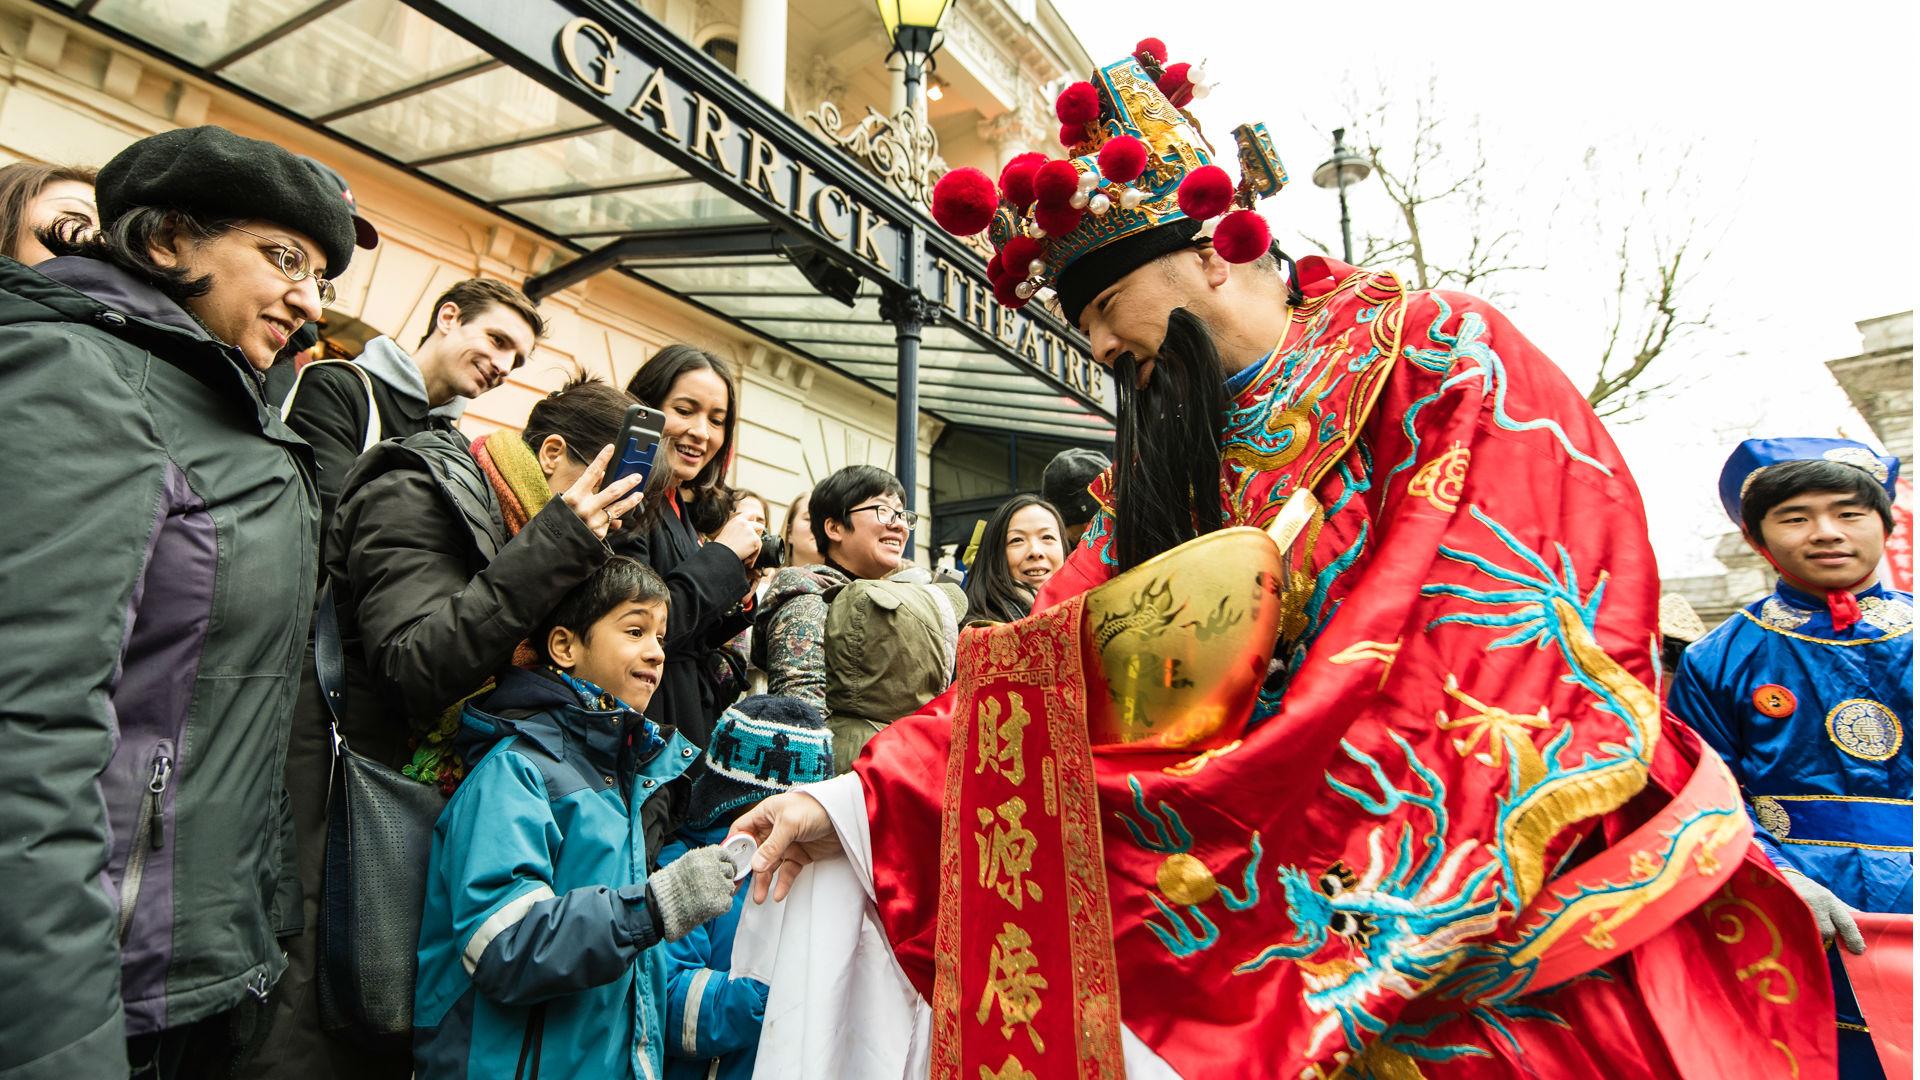 Chinese New Year 2017 parade. Photo by: Jon Mo